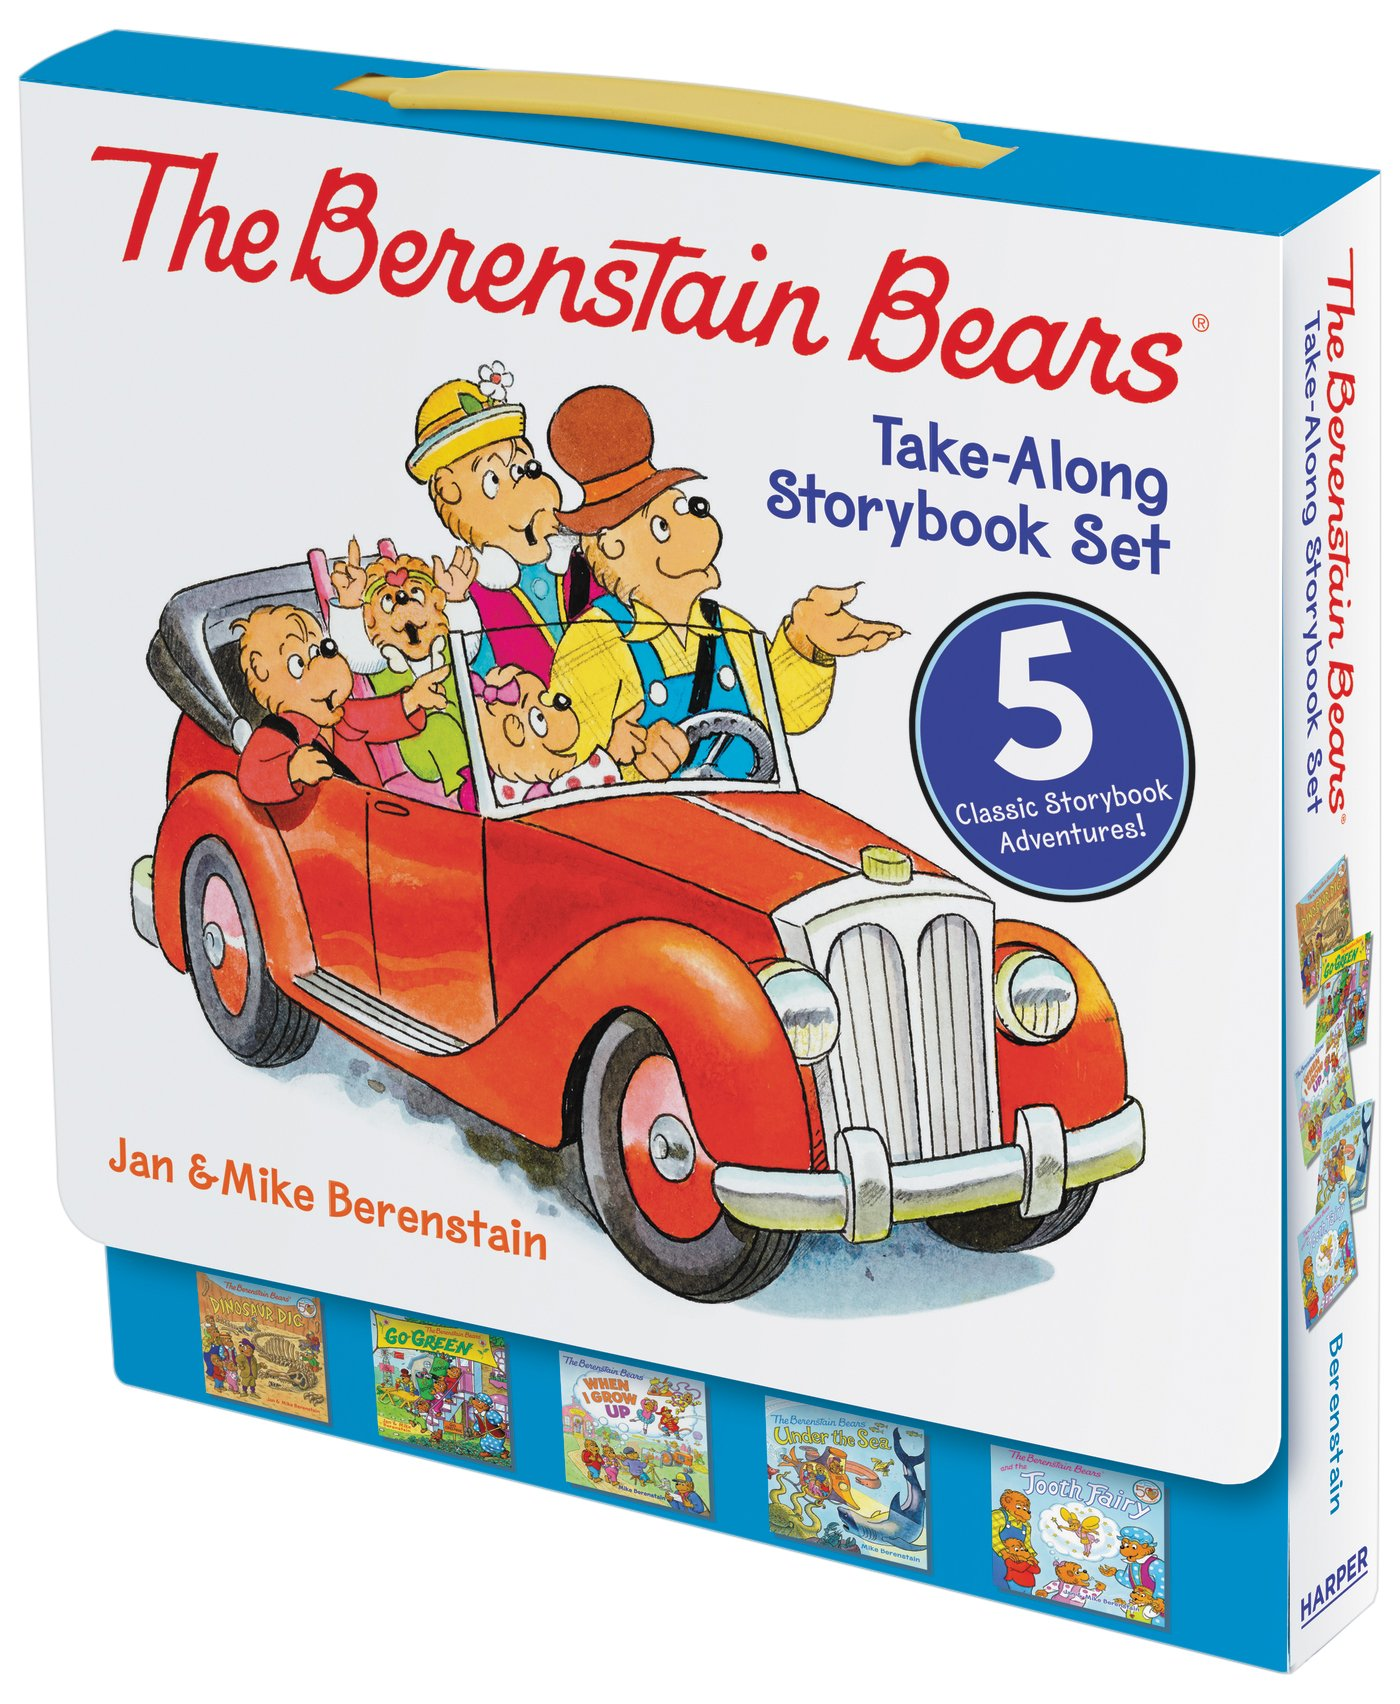 The Berenstain Bears Take Along Storybook Set Dinosaur